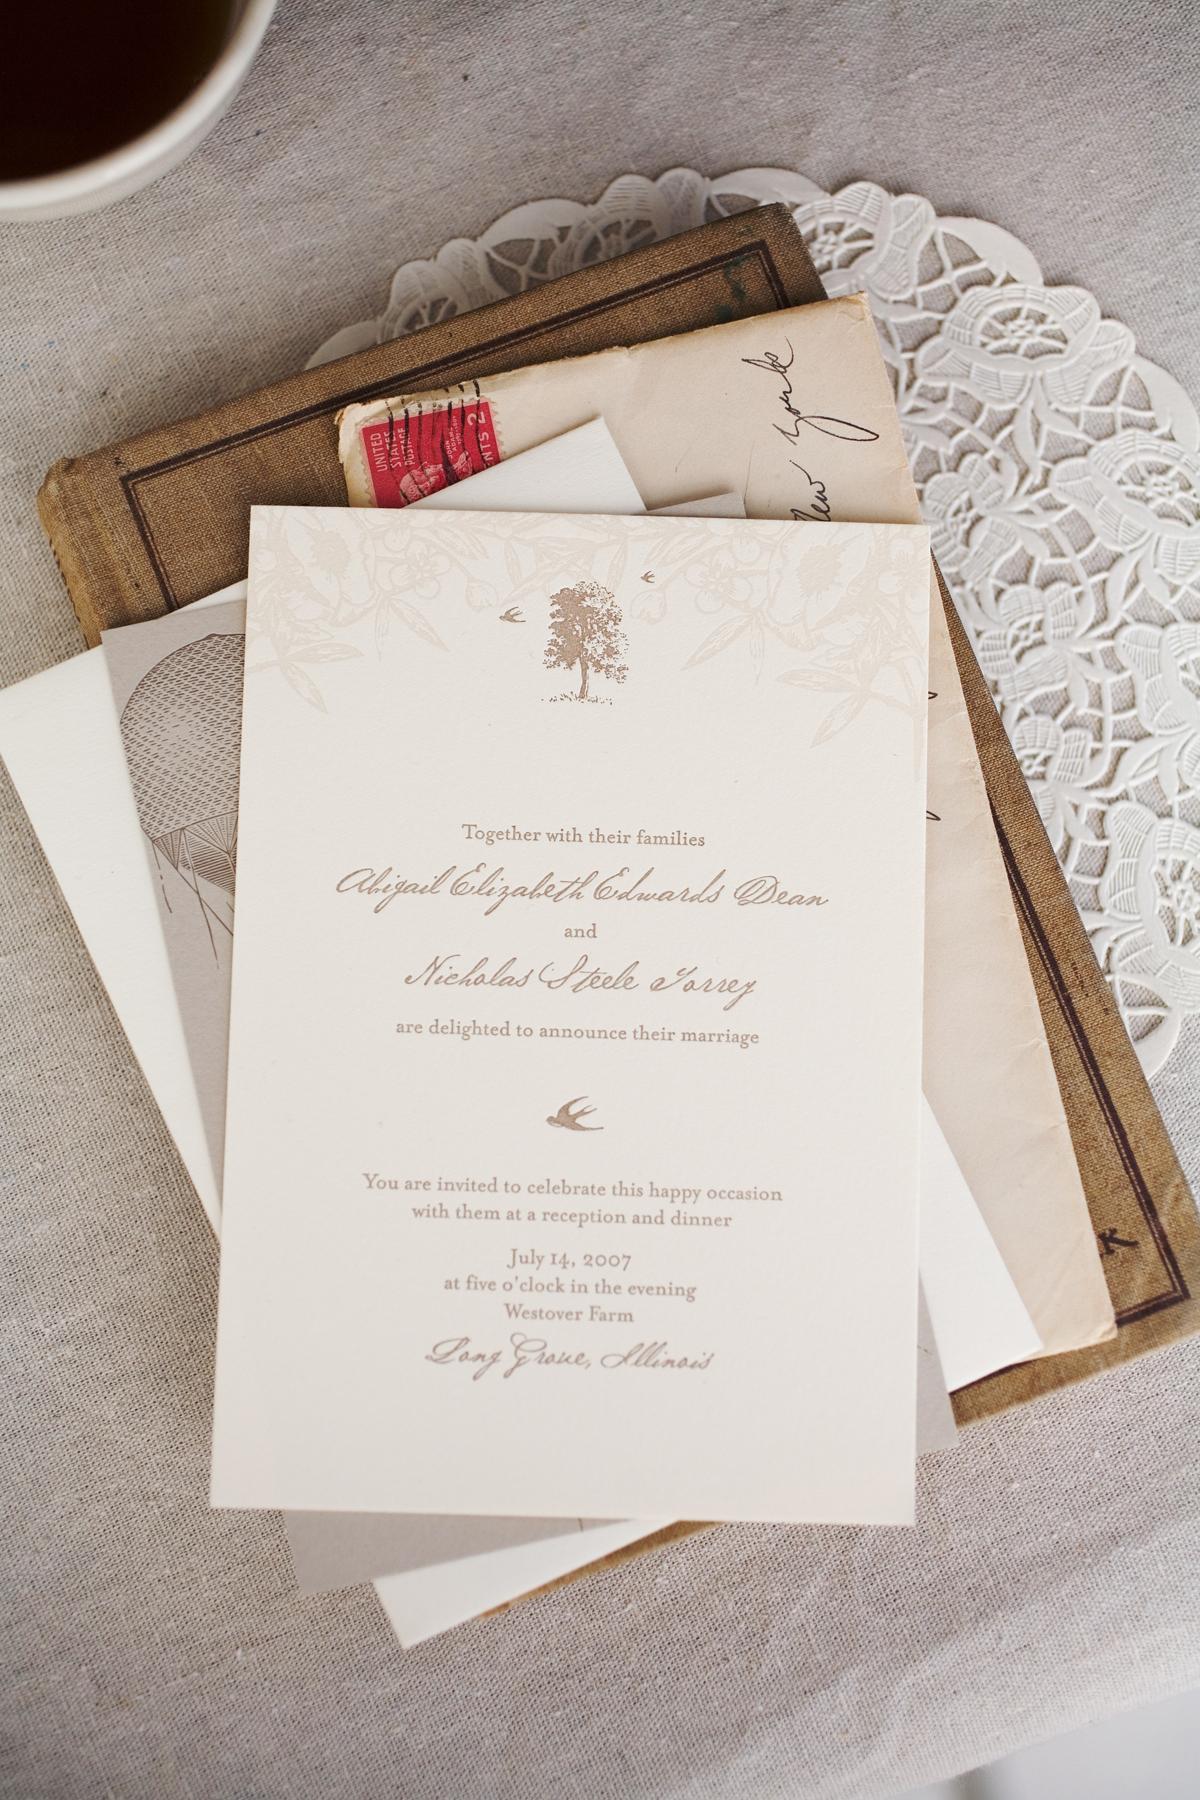 Stationery, invitation, Rustic, Rustic Wedding Invitations, Invitations, Wedding, Hellolucky